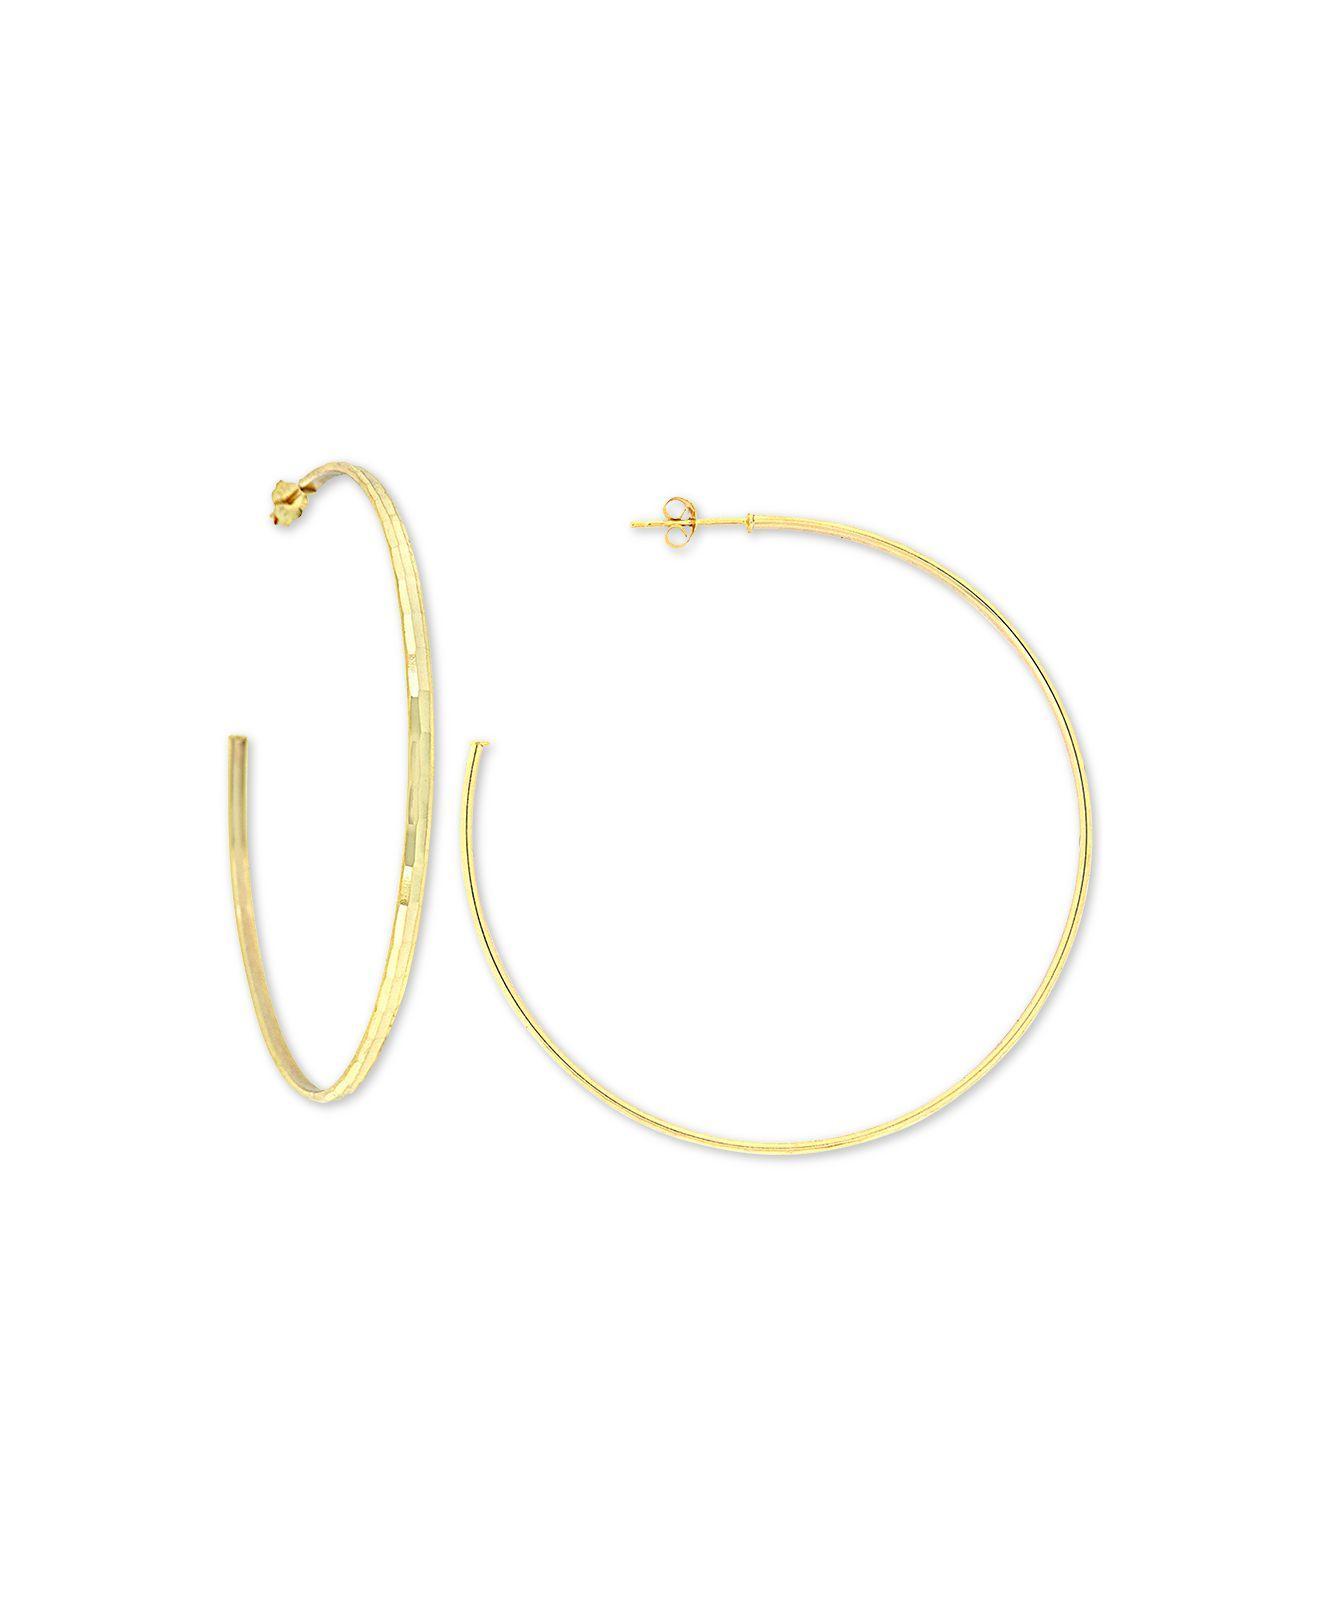 397b9e747 Giani Bernini - Metallic Diamond-cut C-hoop Earrings In 18k Gold-plate.  View fullscreen